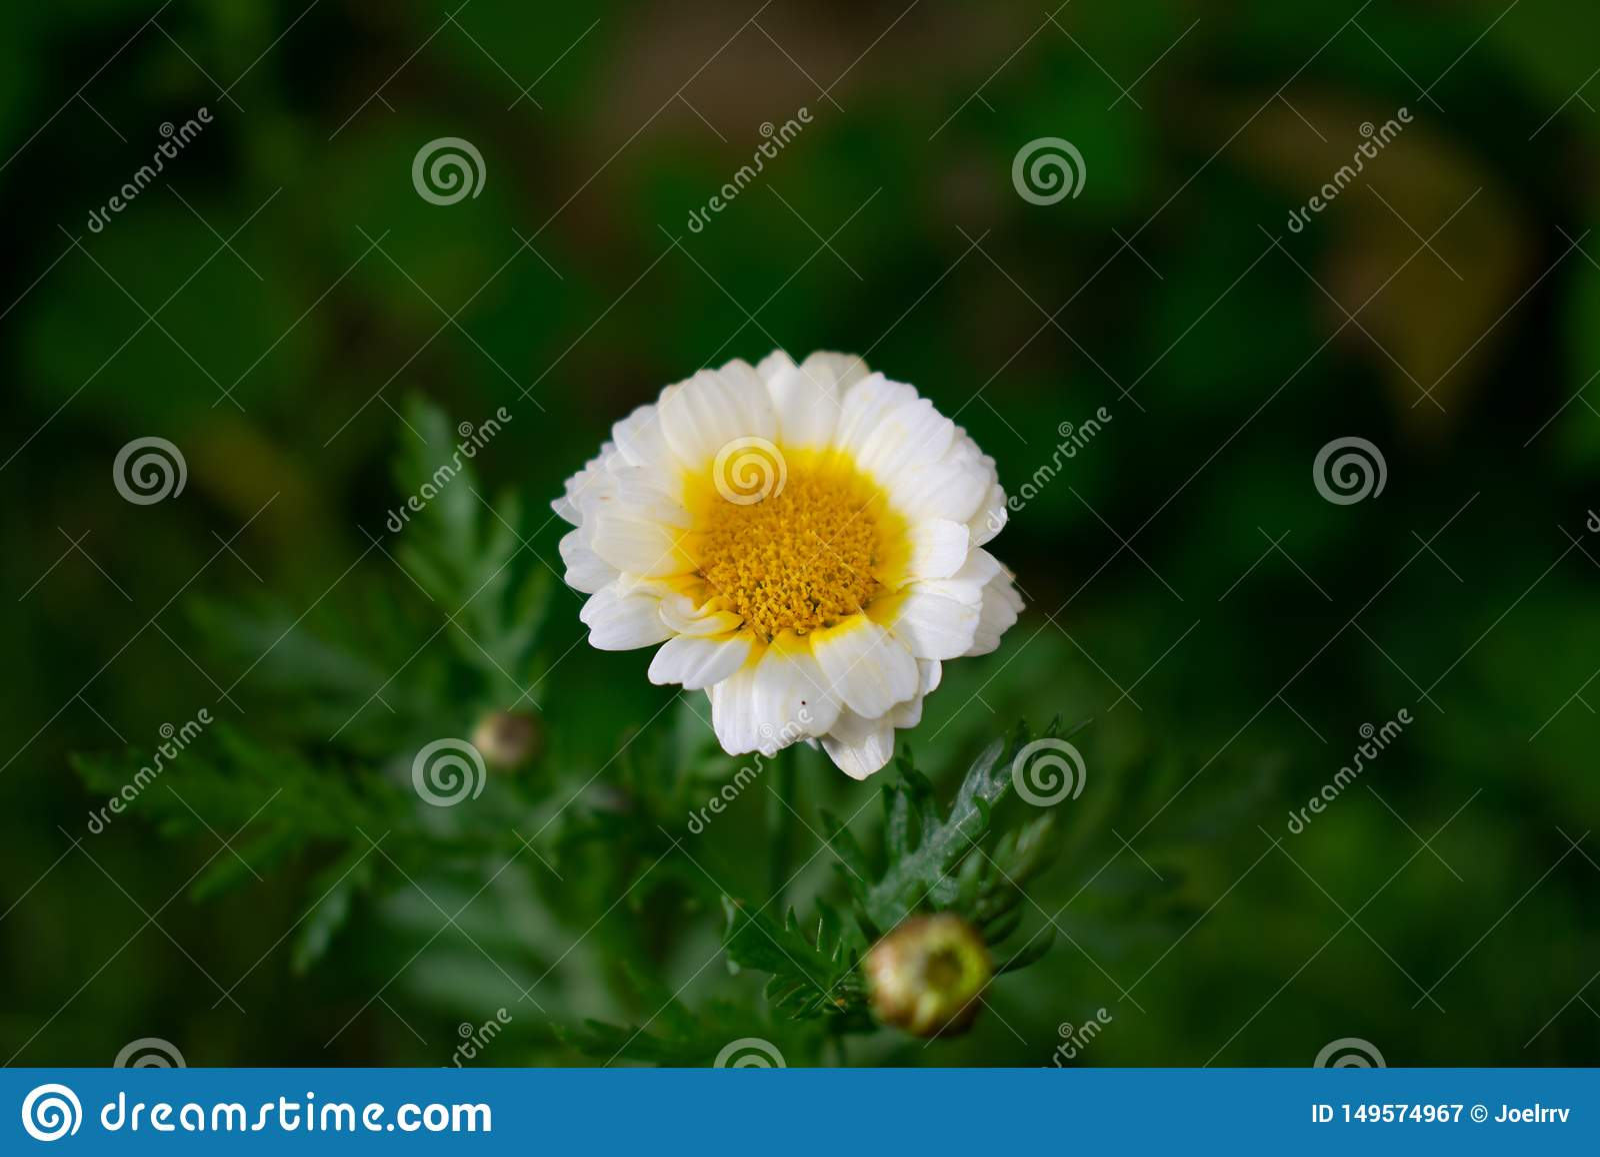 Flor da camomila no fundo obscuro verde